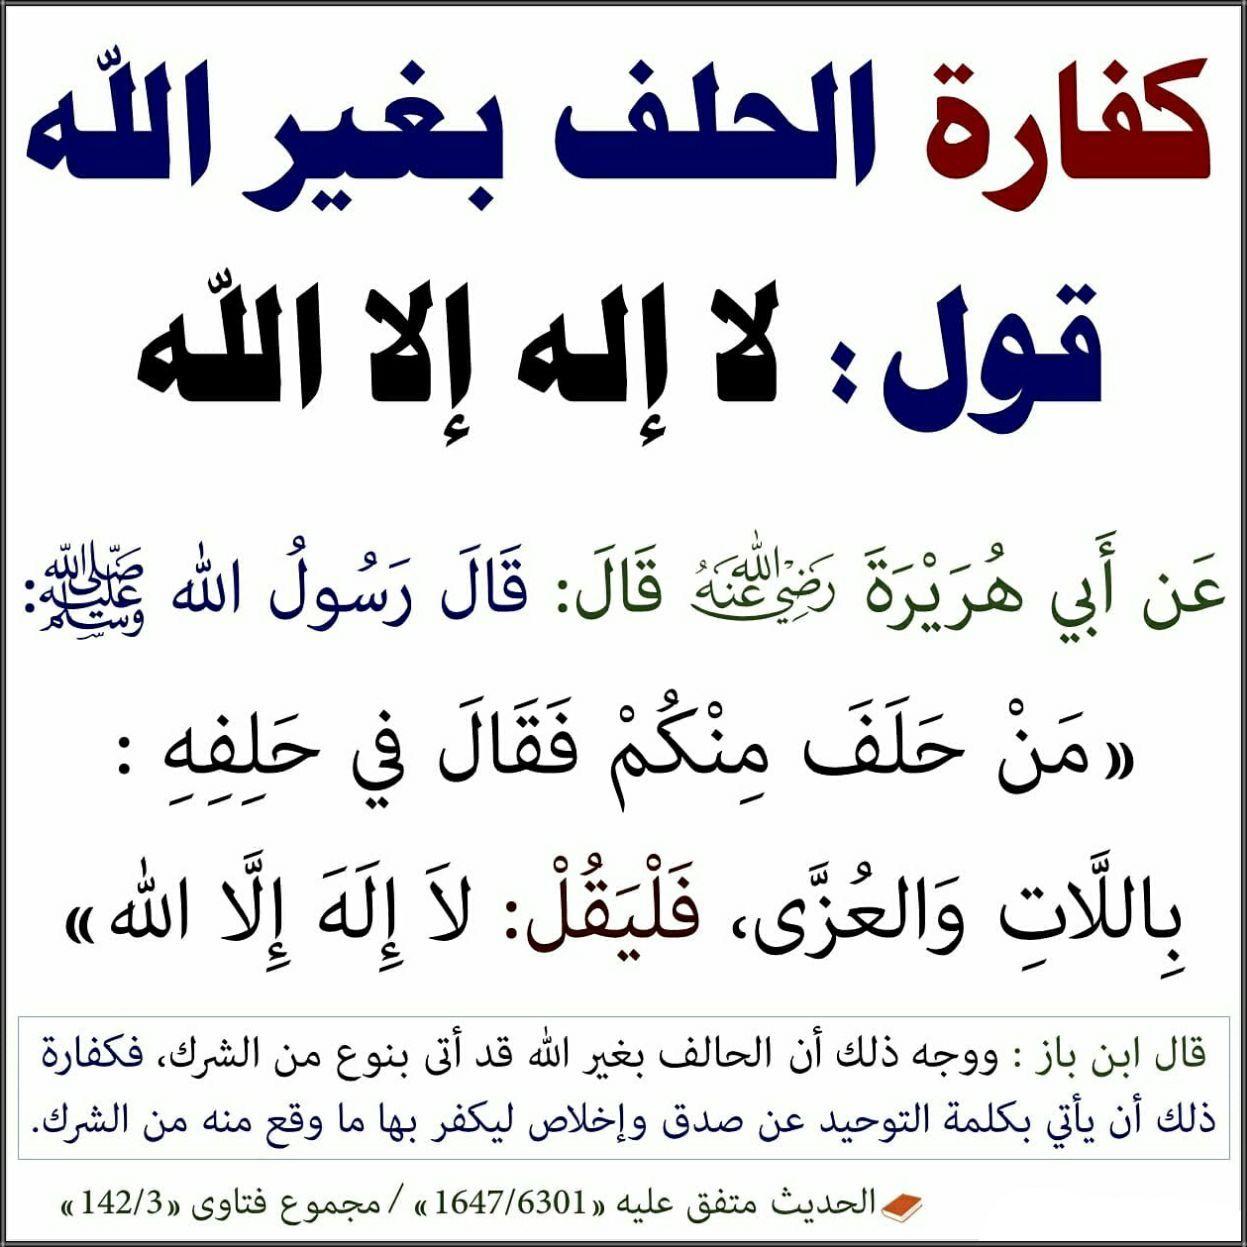 Pin By بلورة الماس On أحاديث نبوية Beautiful Arabic Words Islamic Quotes Islamic Quotes Quran